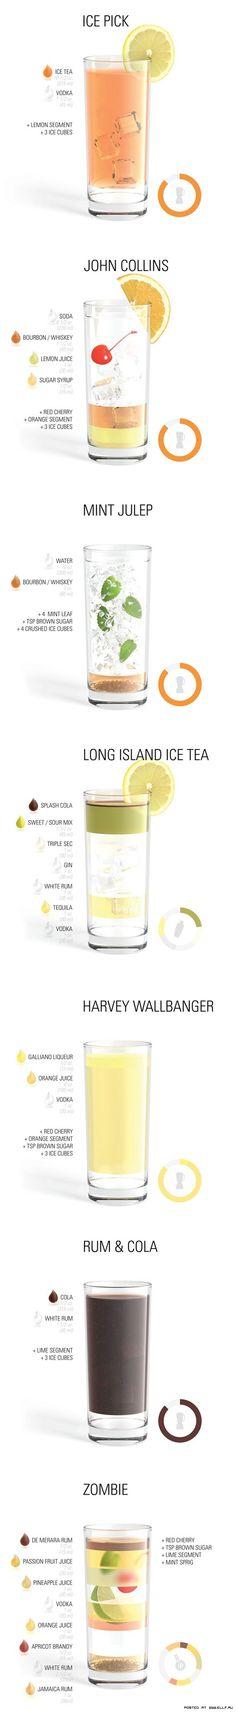 Amazing mixed drinks chart.